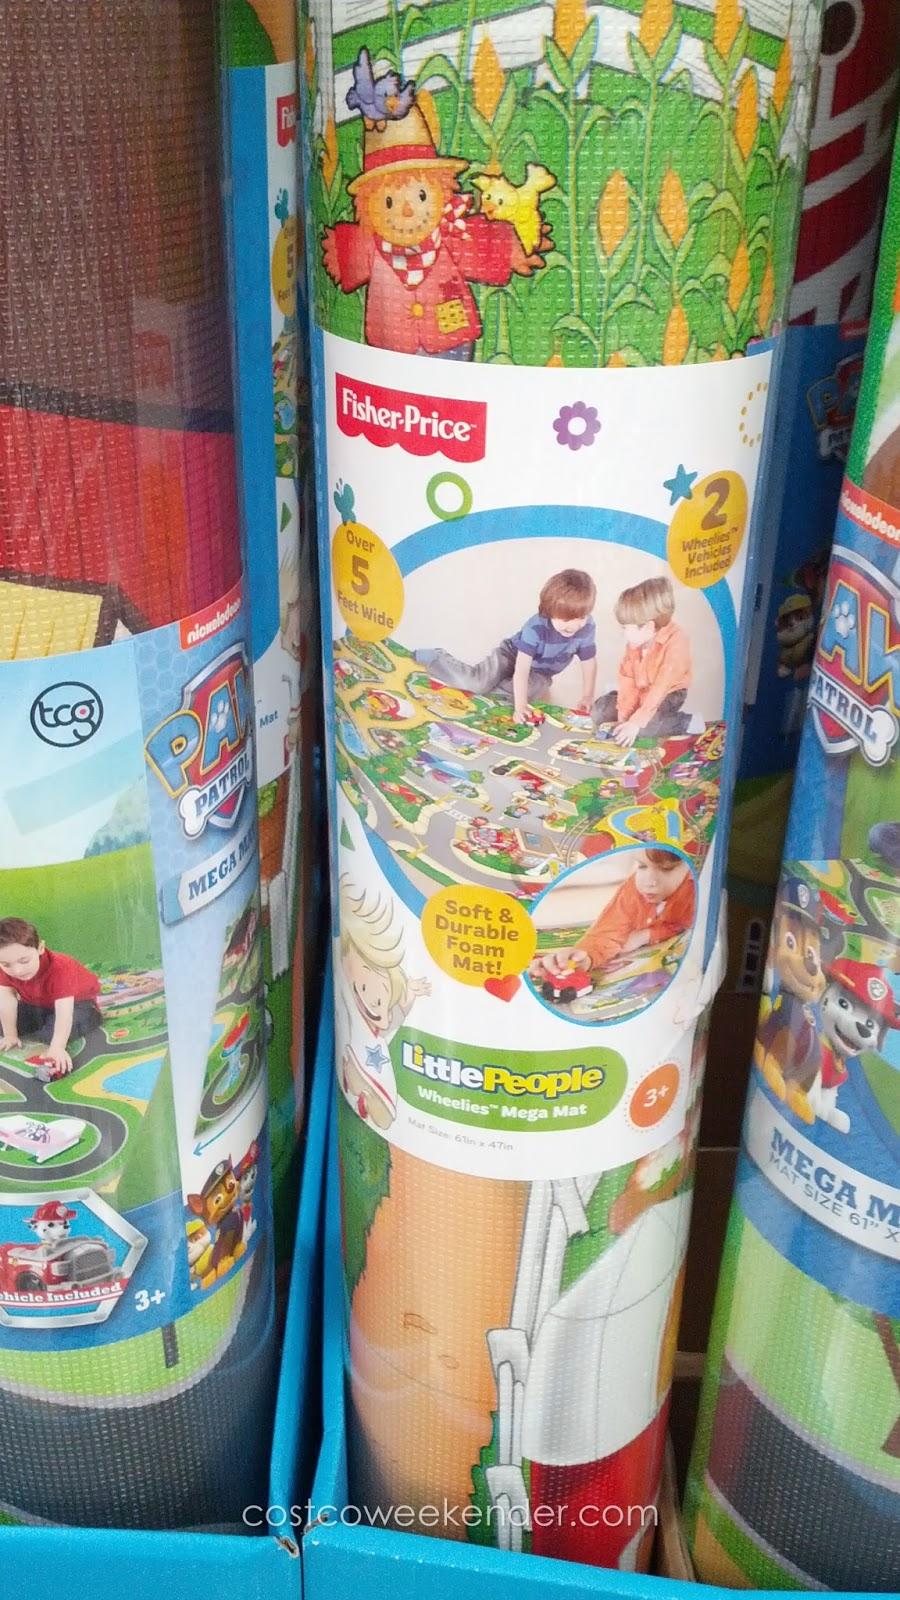 Children 39 s mega mat costco weekender - Costco toys for kids ...